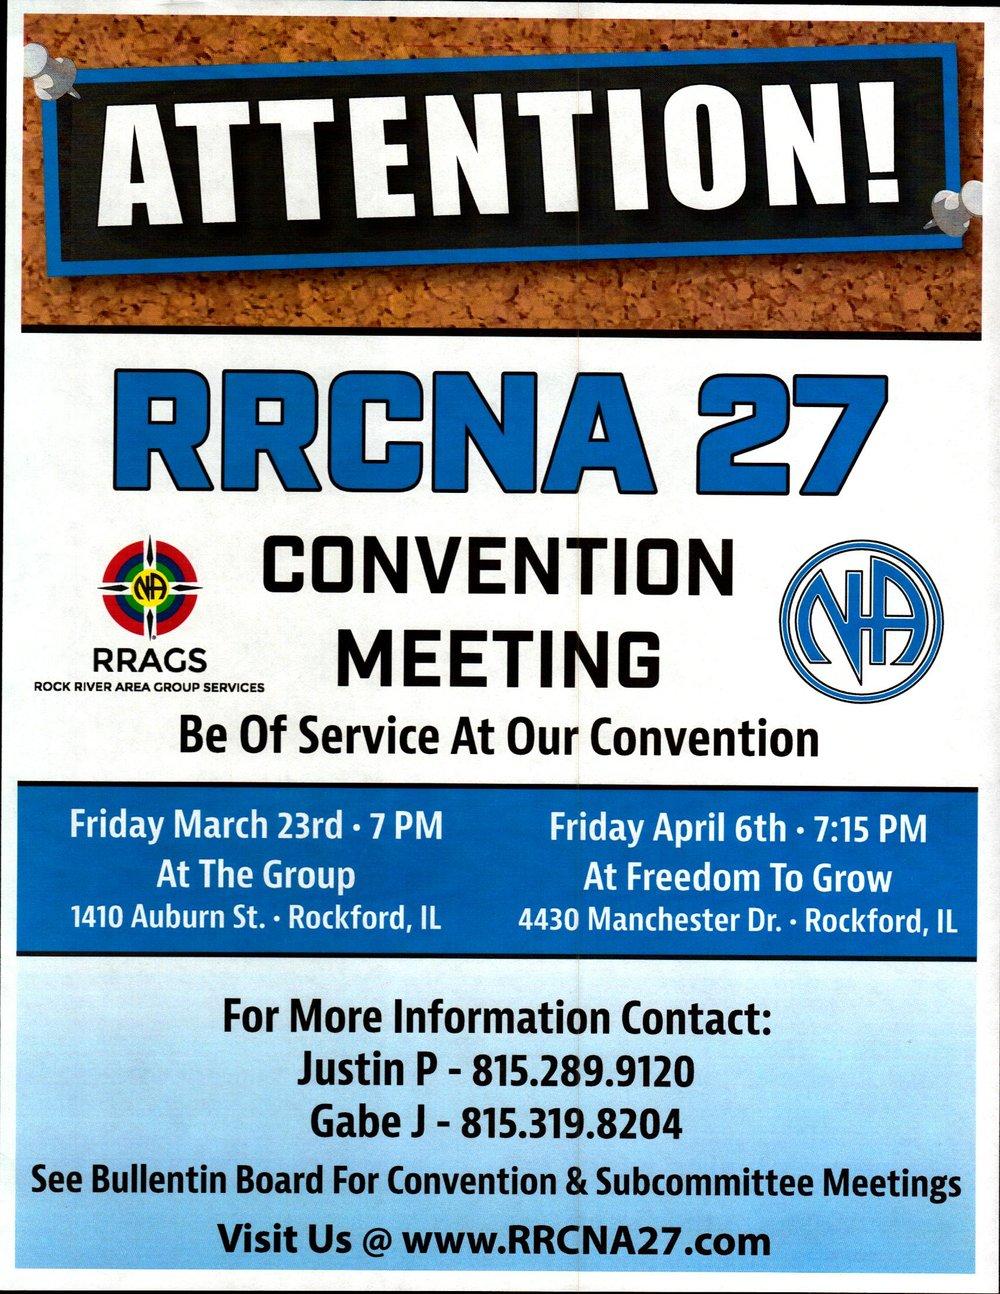 ConventionCommittee.jpg